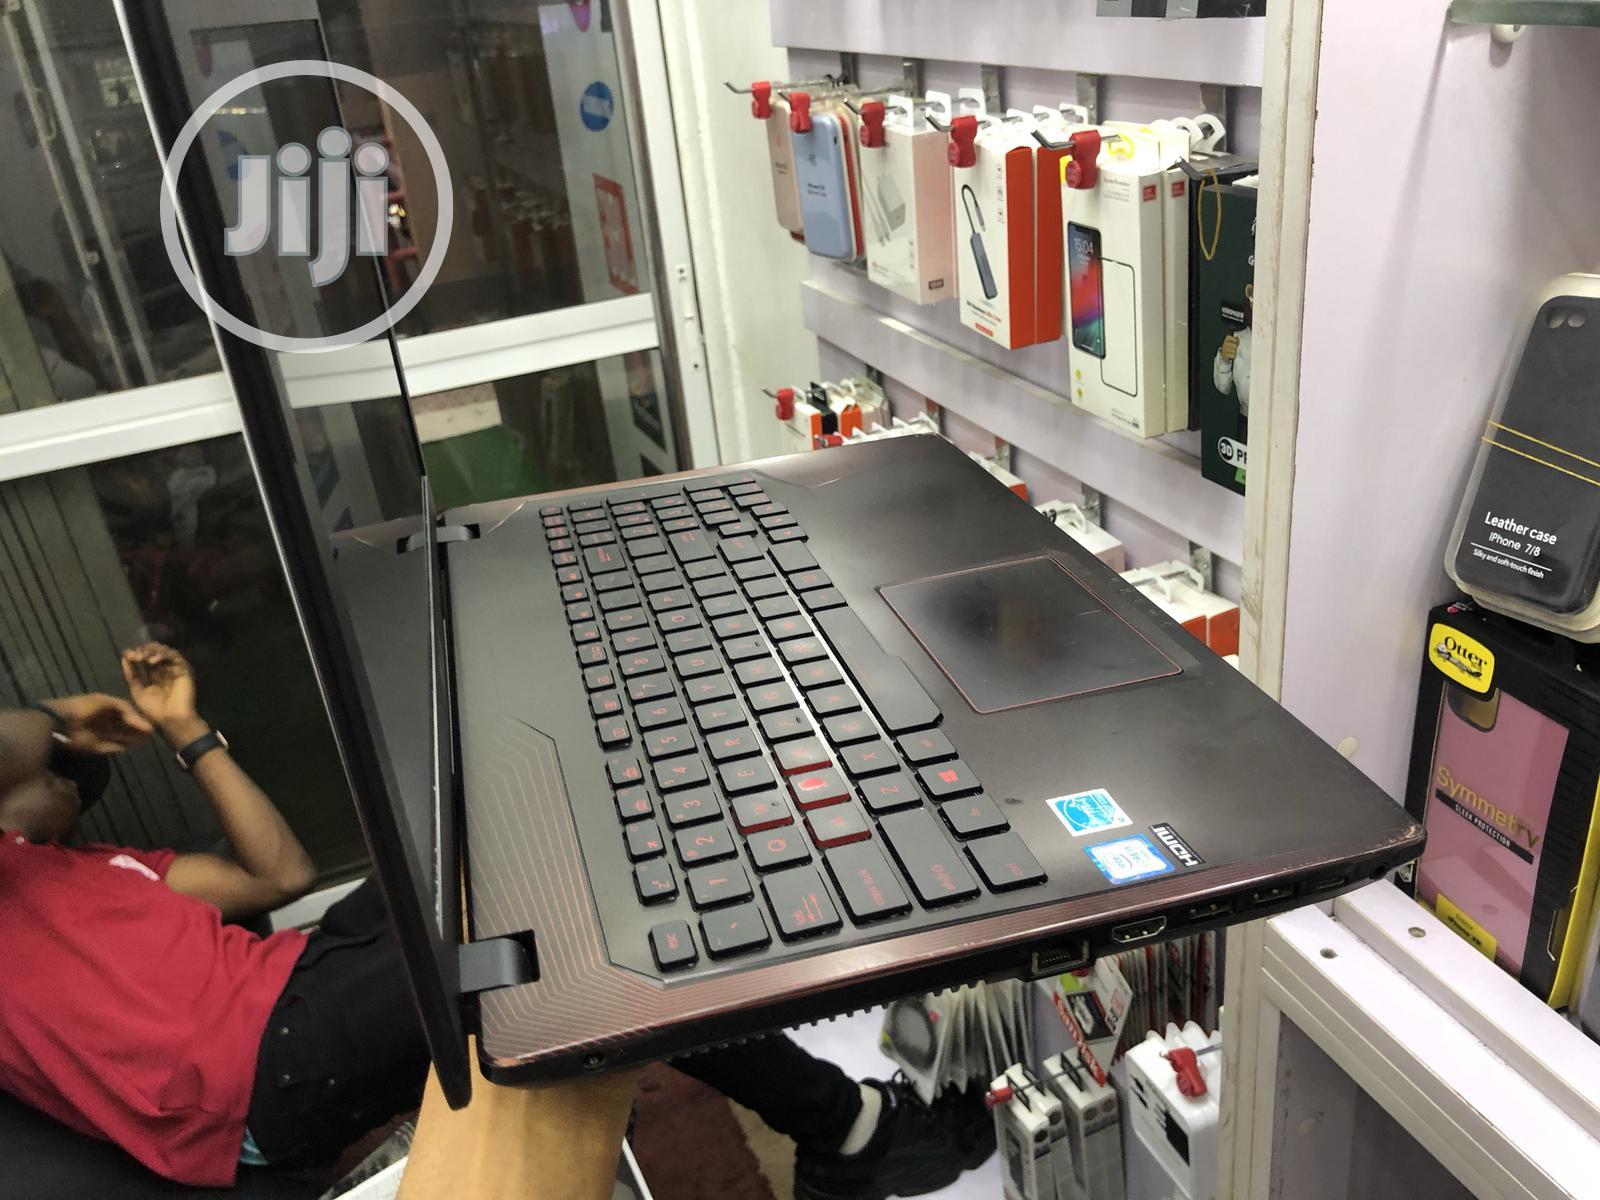 Laptop Asus Zephyrus M GU502GW-AH76 8GB Intel Core i5 SSD 512GB